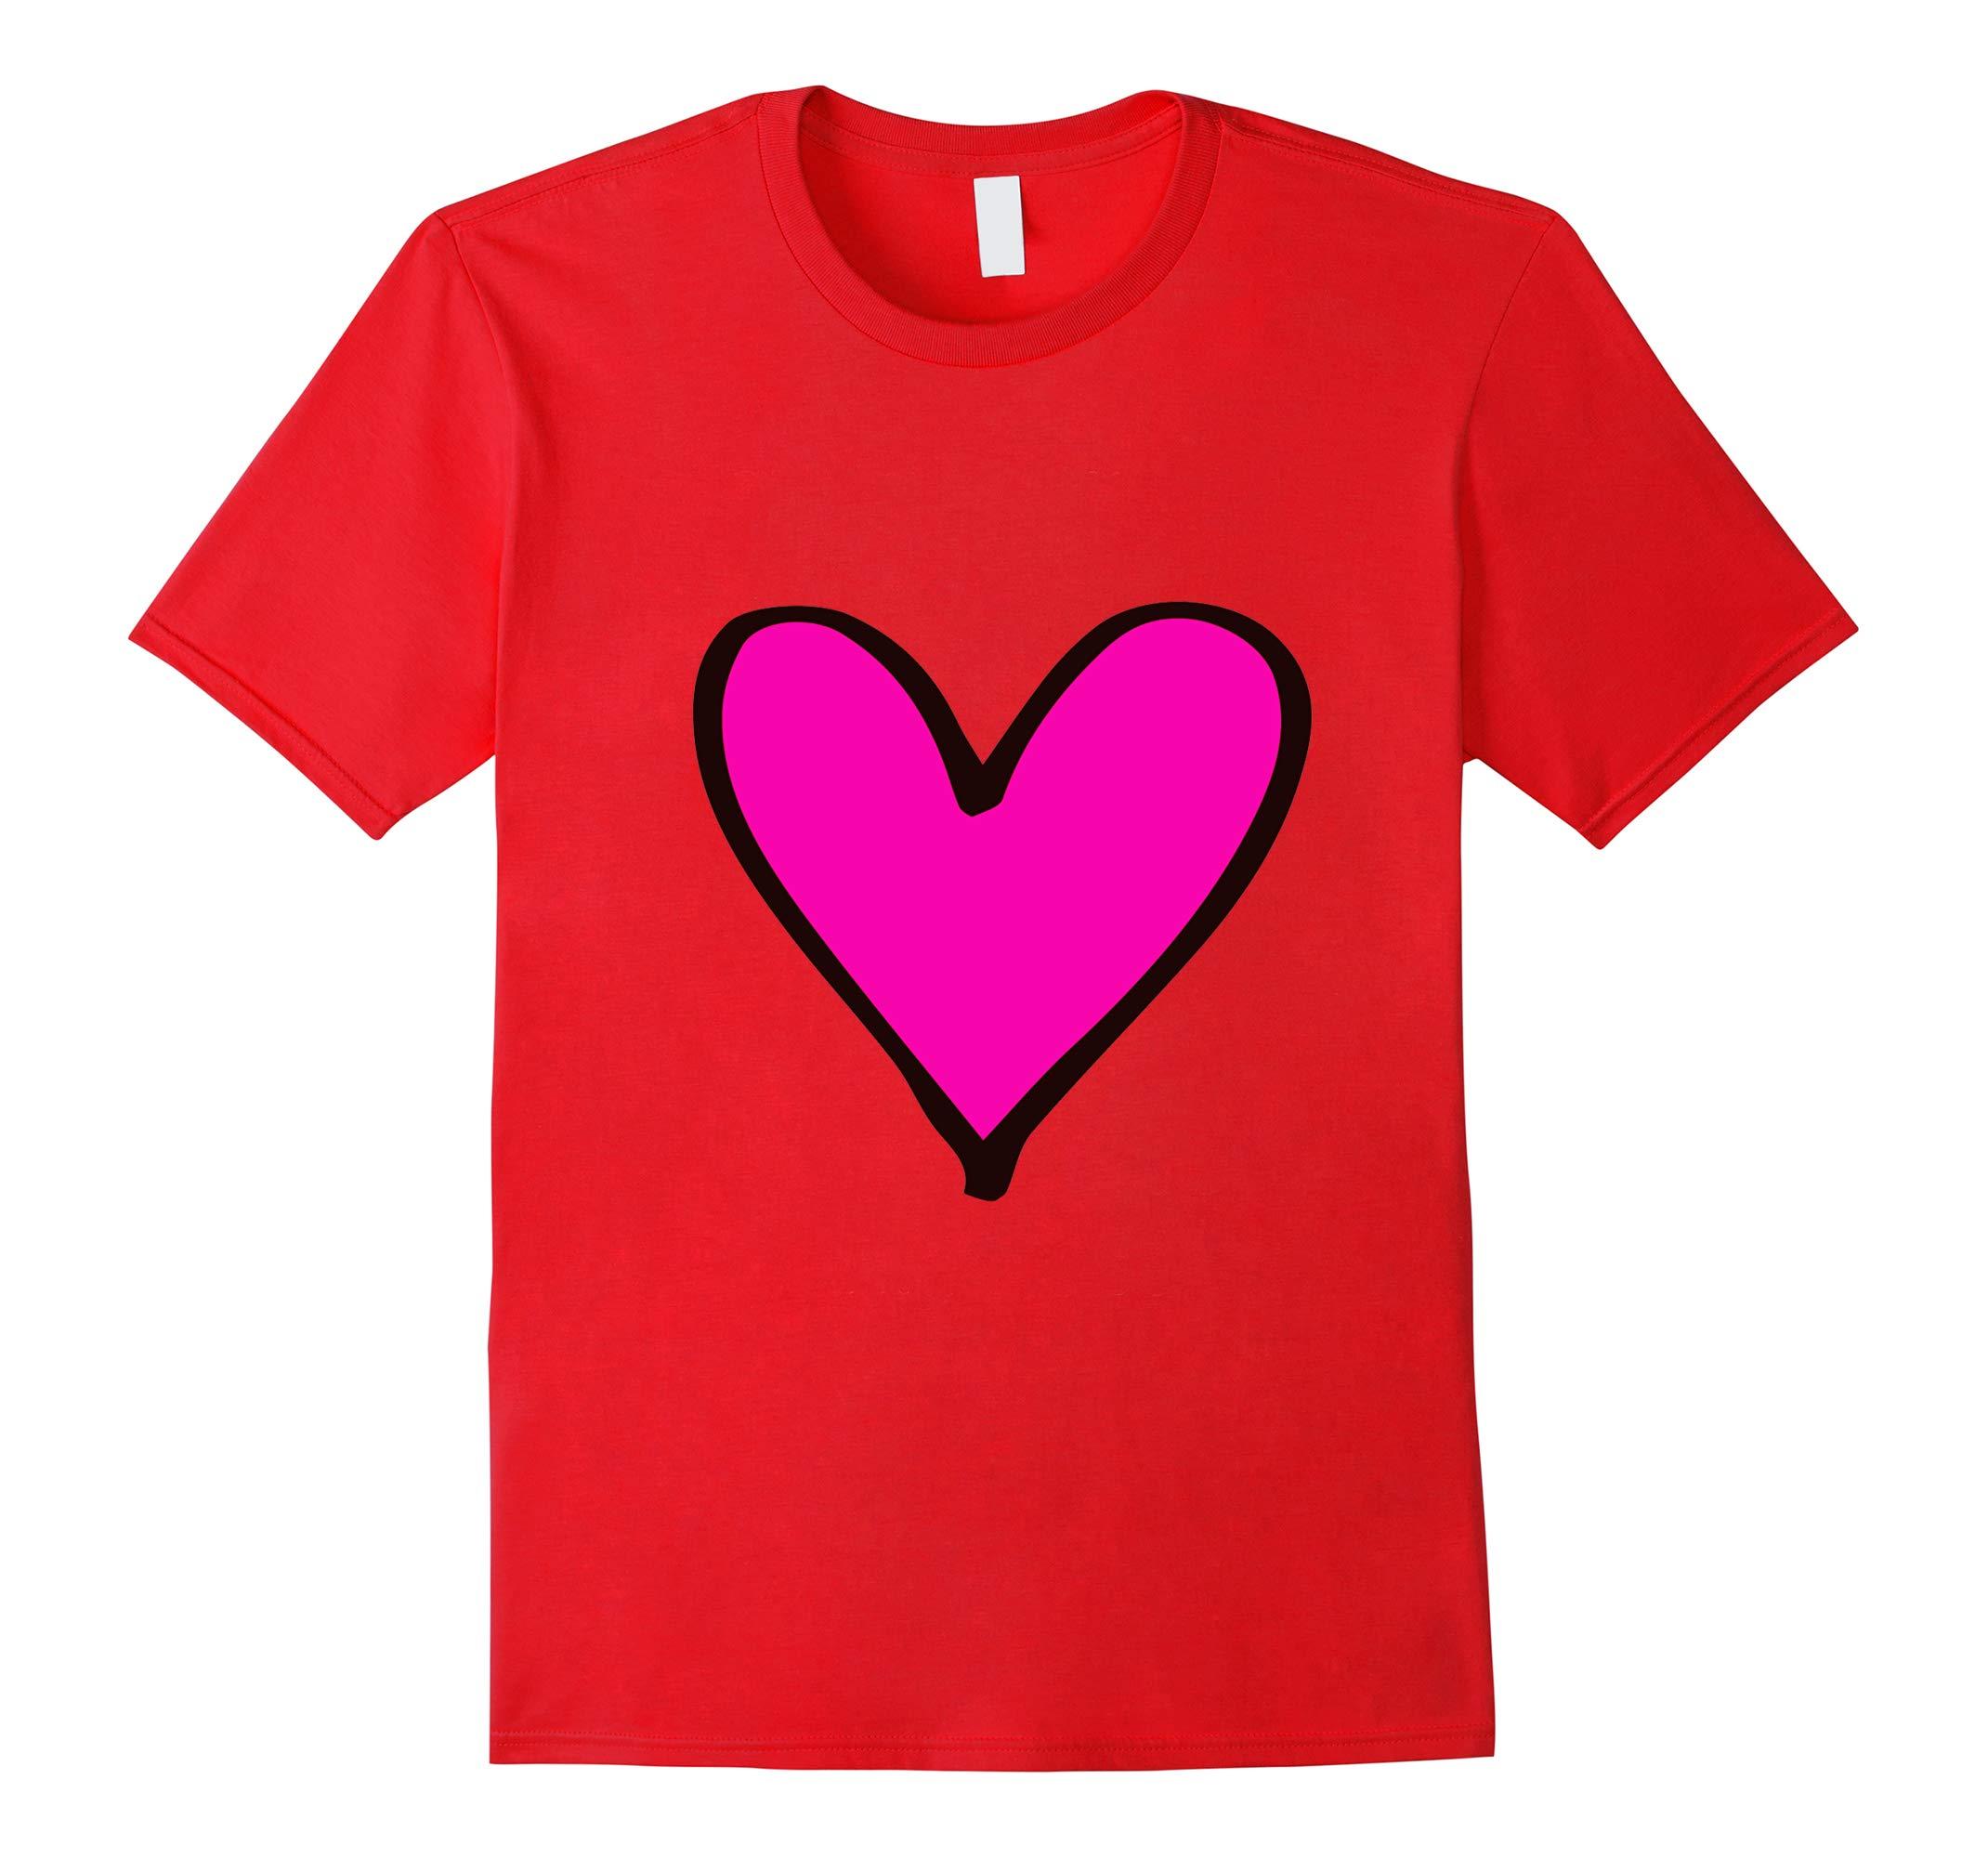 Valentines Day Heart T Shirt Pink Heart Tee For Women Girls-RT